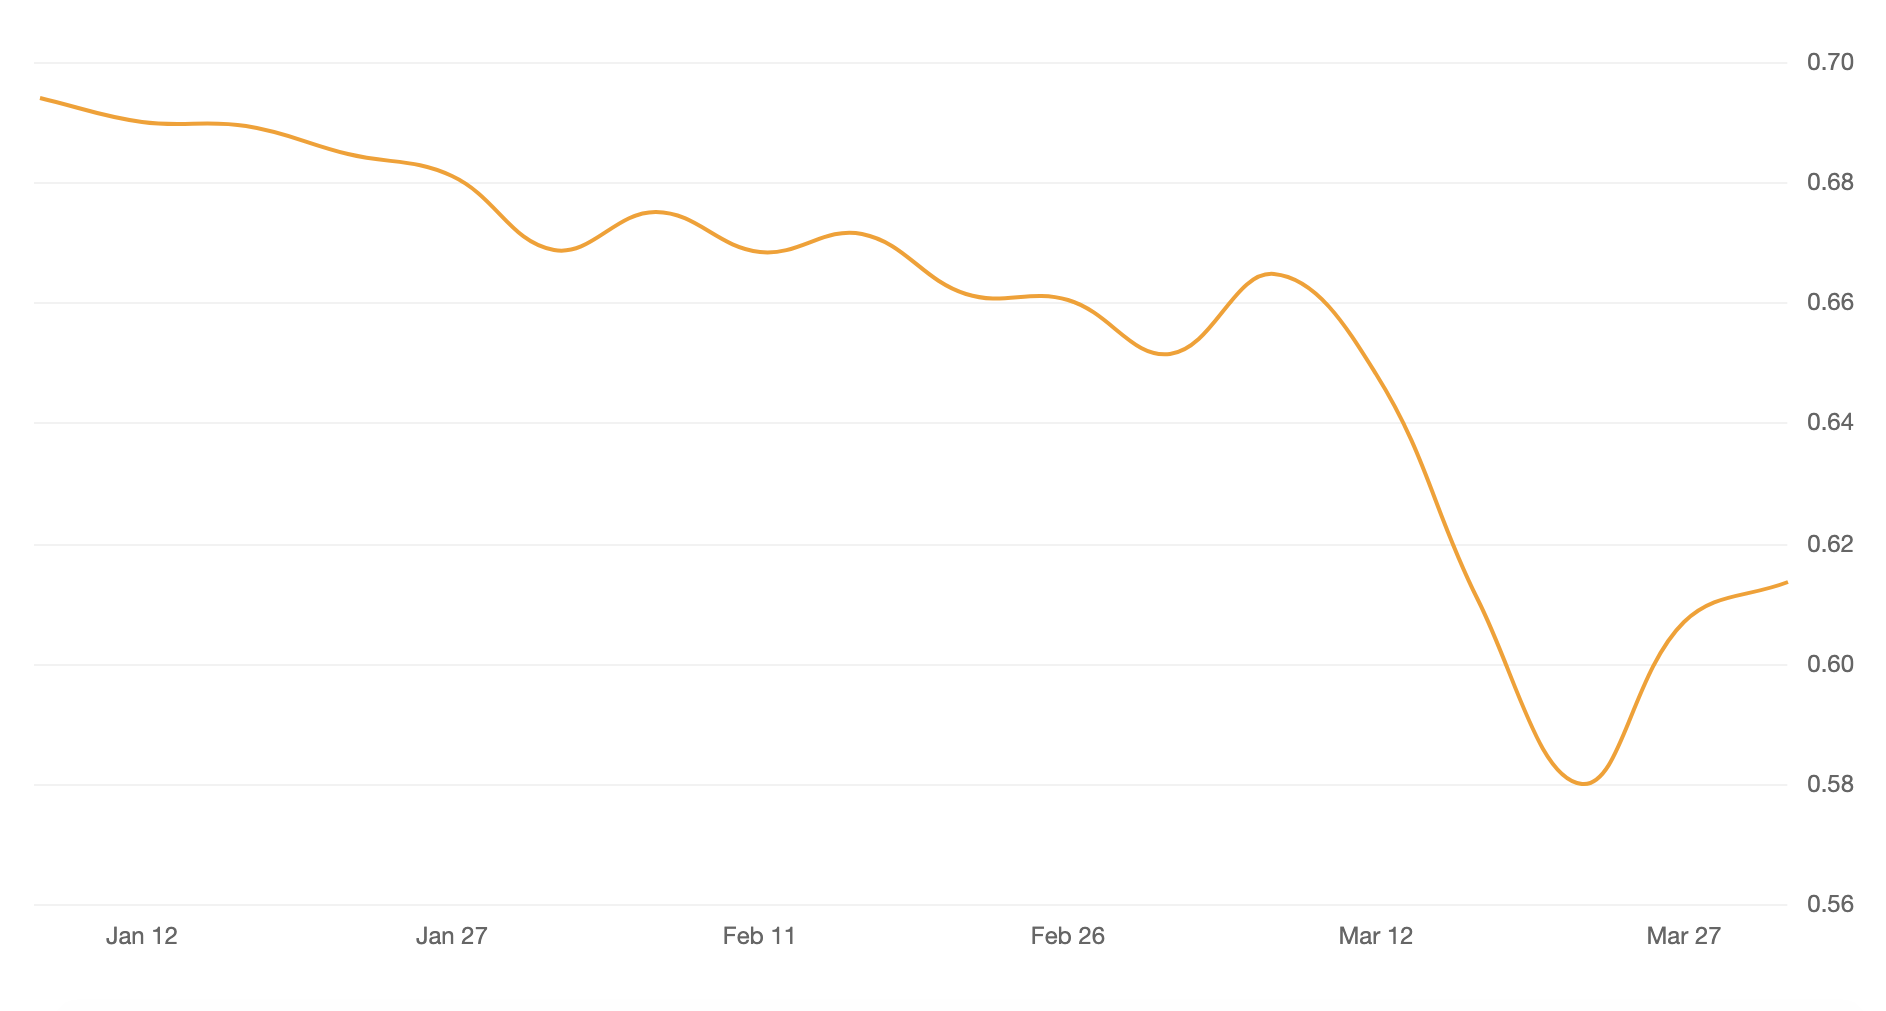 AUD USD graph